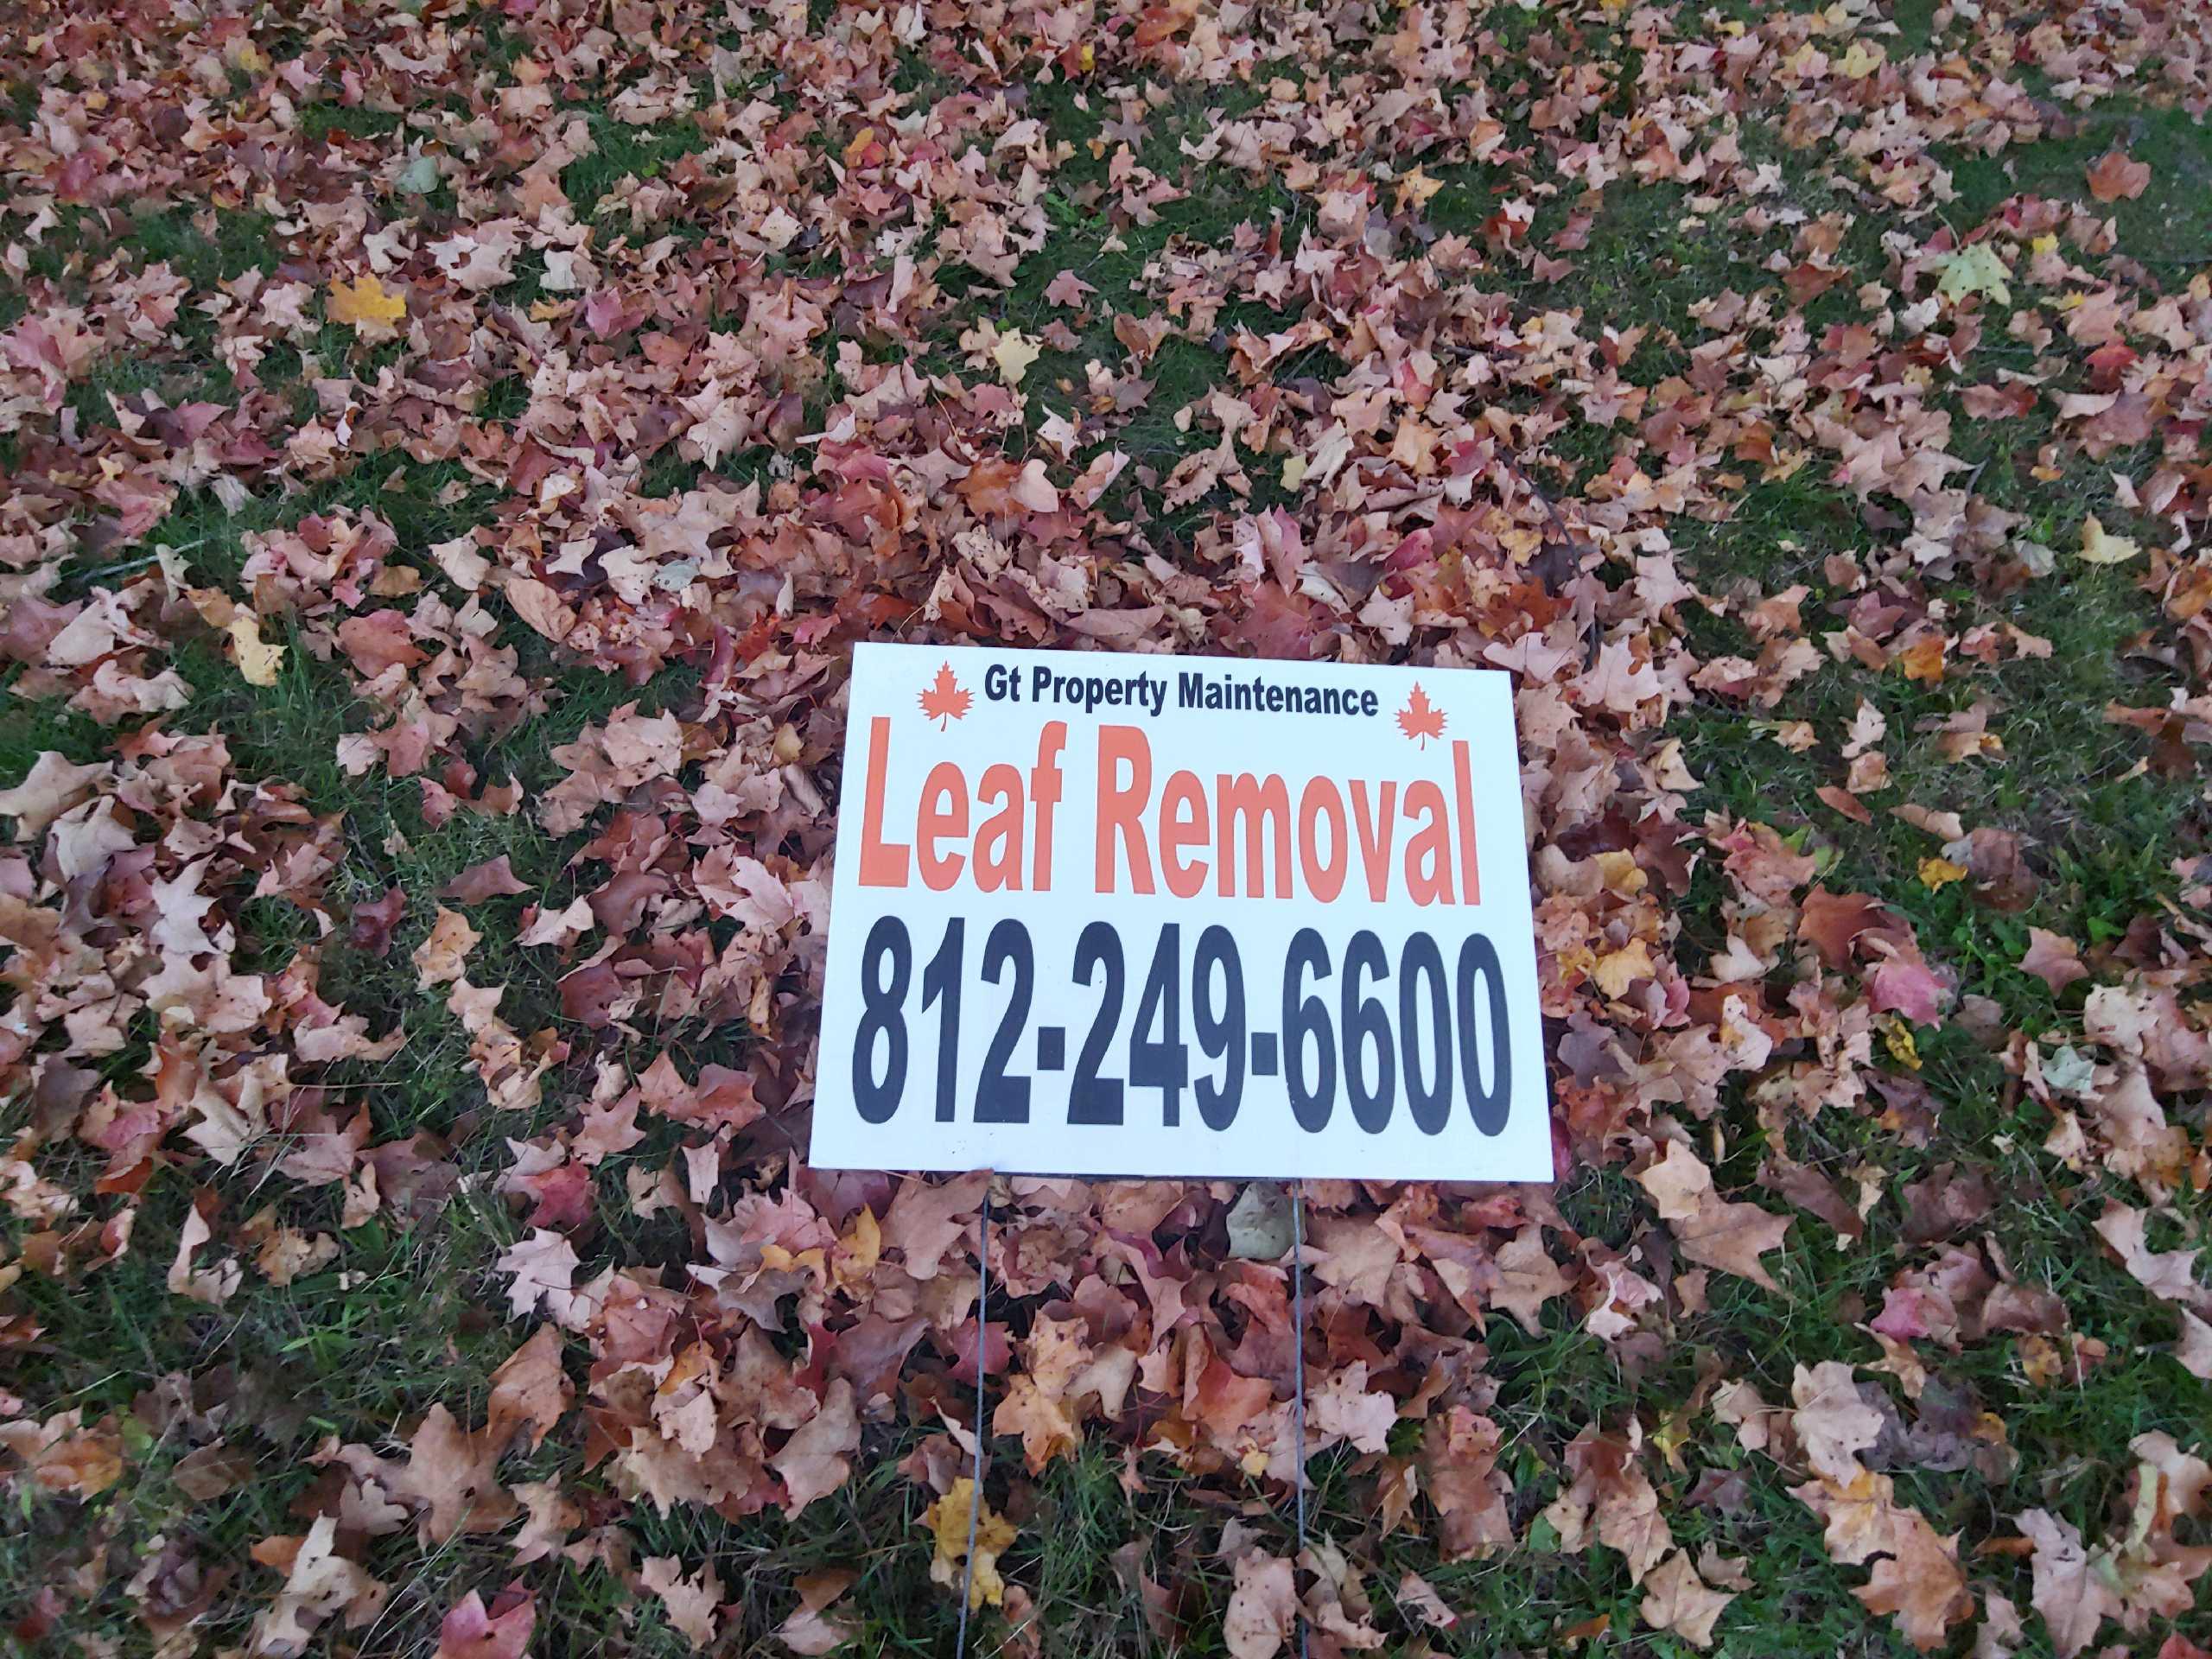 grant leaf sign 1104191701.jpg